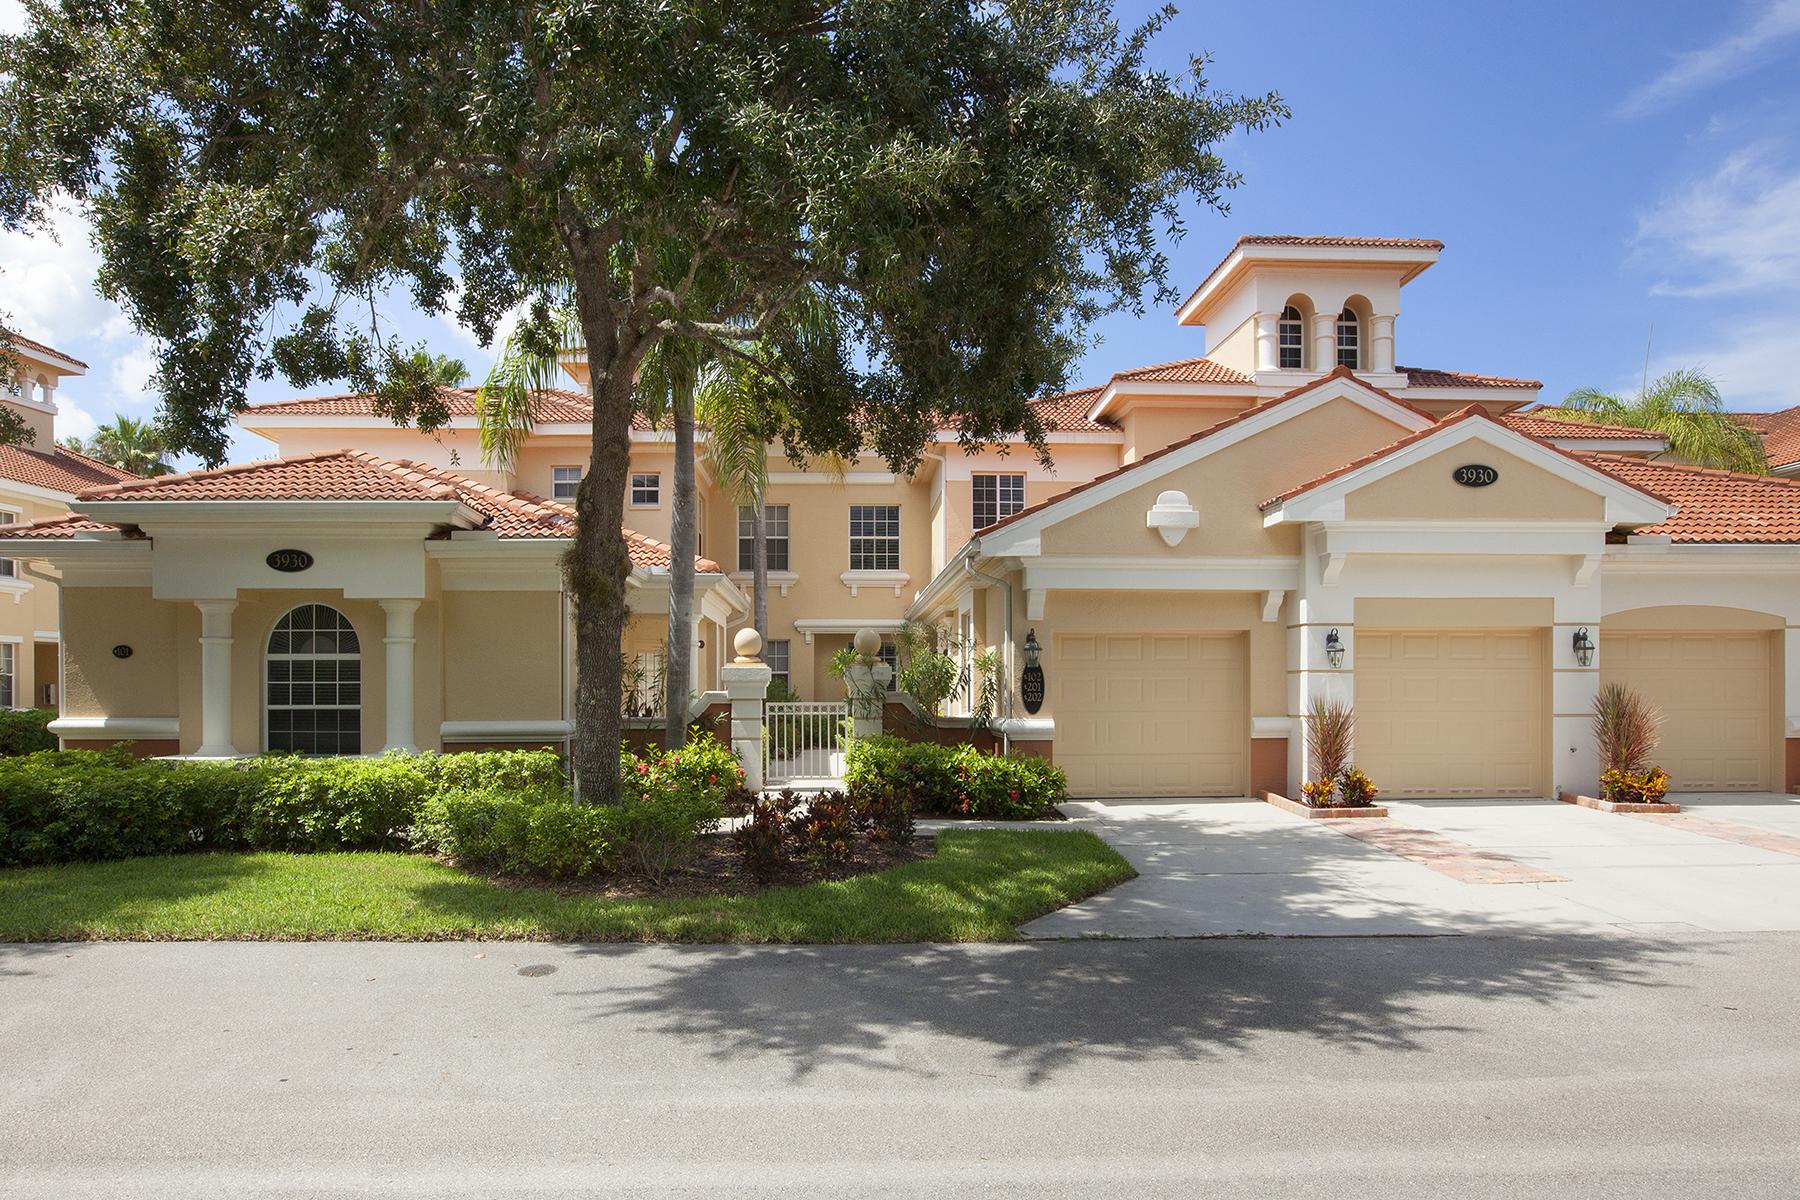 Eigentumswohnung für Verkauf beim FIDDLER'S CREEK - DEER CROSSING 3930 Deer Crossing Ct 202 Naples, Florida 34114 Vereinigte Staaten